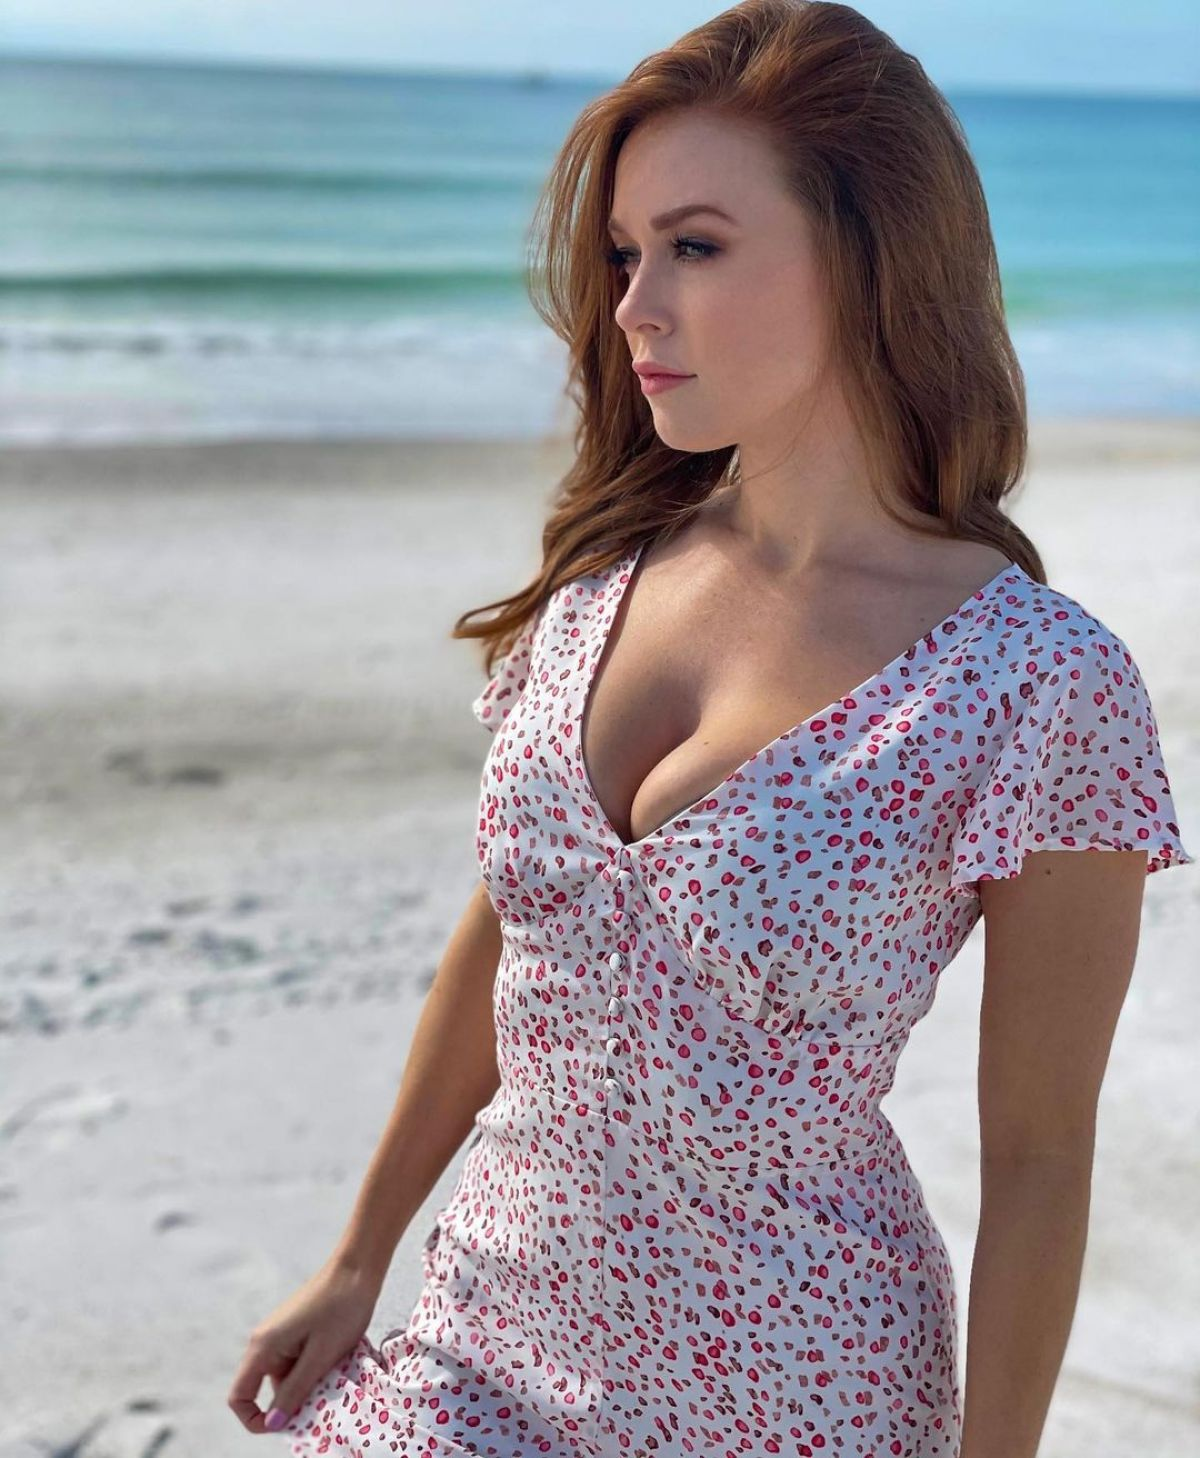 LEANNA DECKER at a Beach - Instagram Photos 01/16/2021